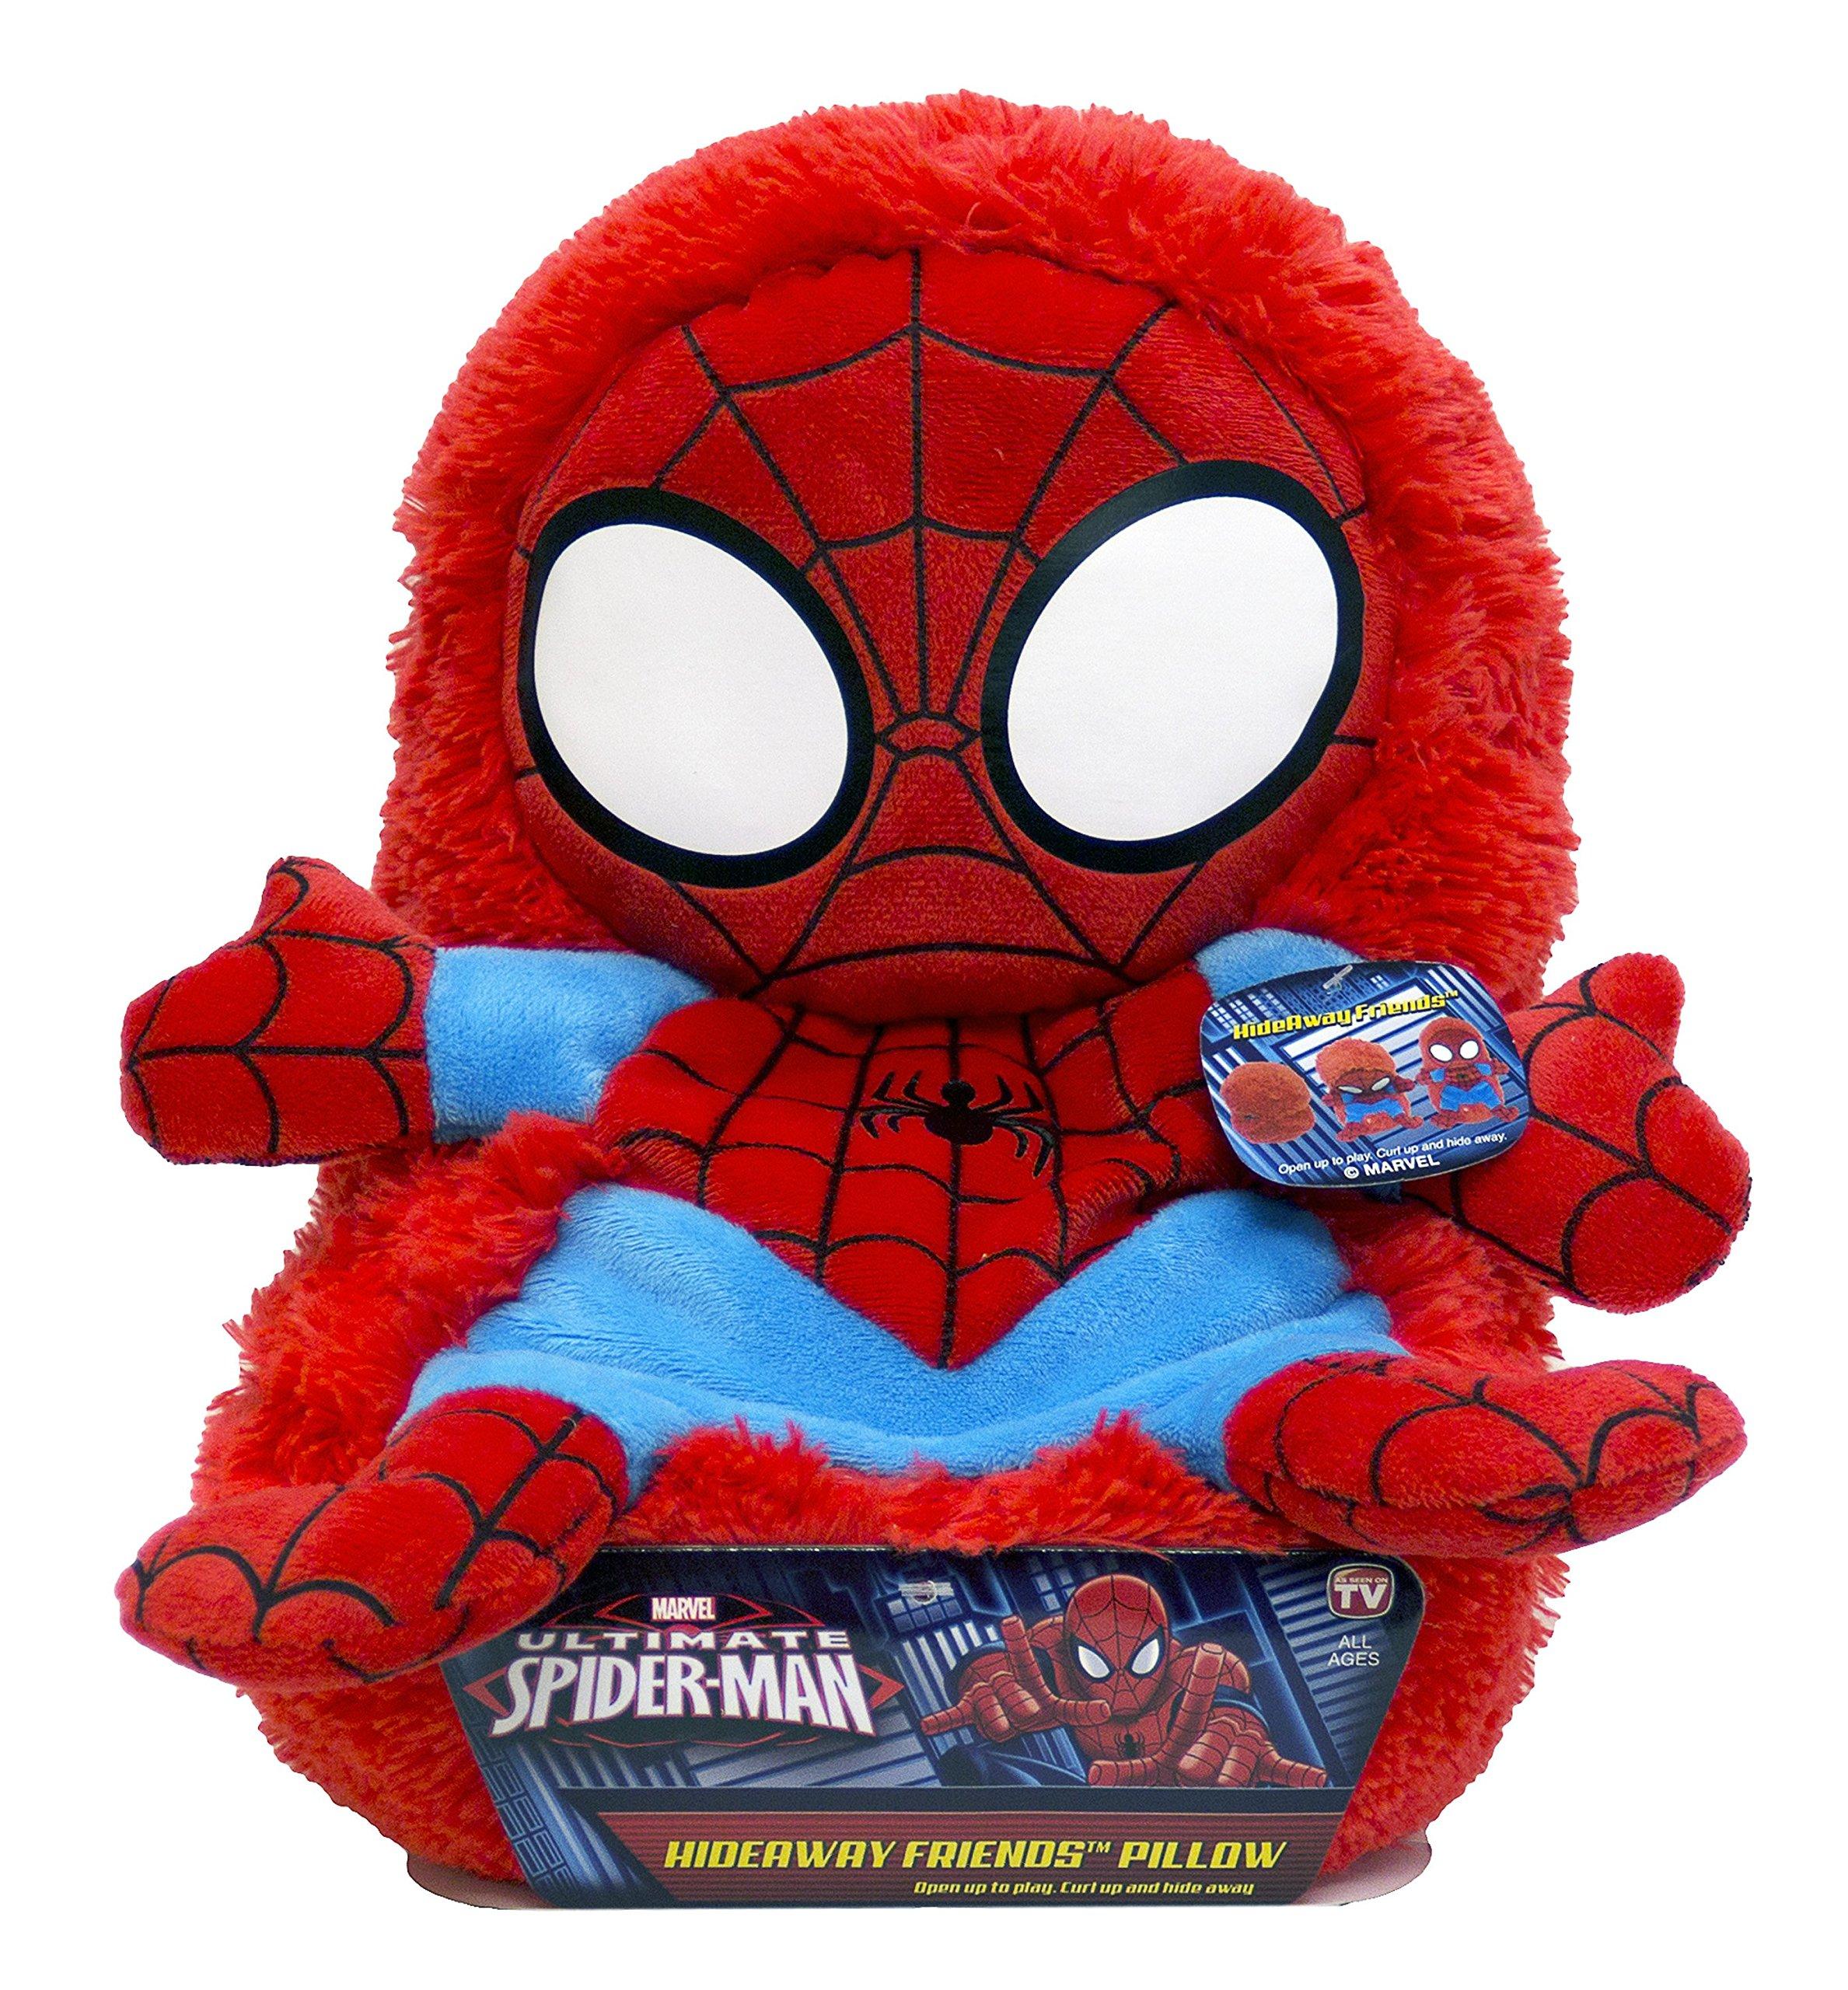 Marvel JF22404ECCD Spiderman 14'' Hideaway Pet Pillow